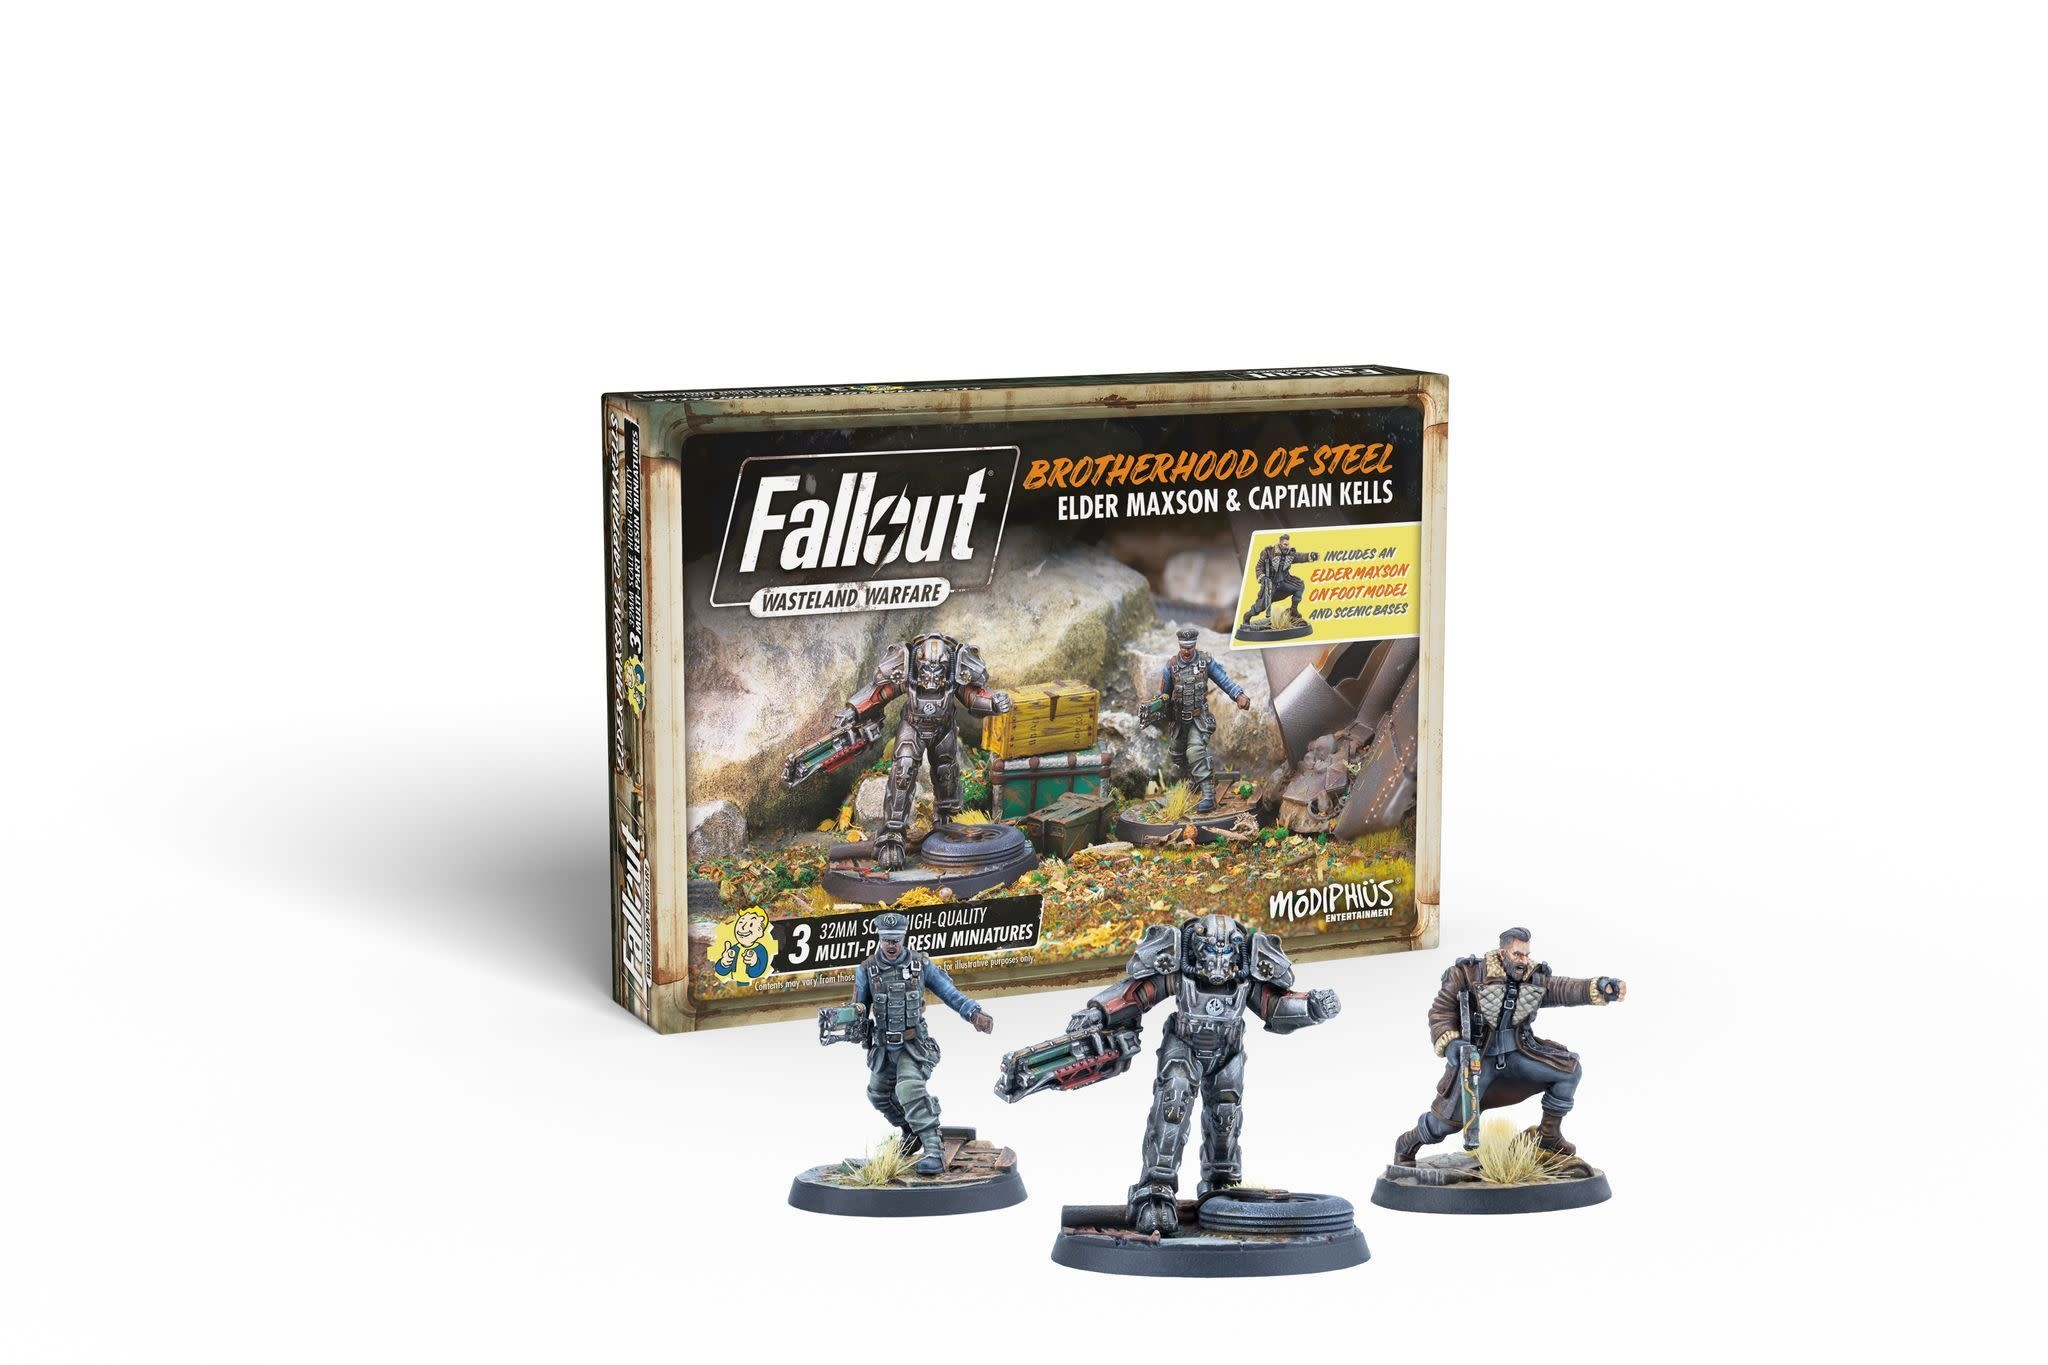 Modiphius Fallout Wasteland Warfare: Brotherhood- Elder Maxson & Captain kells